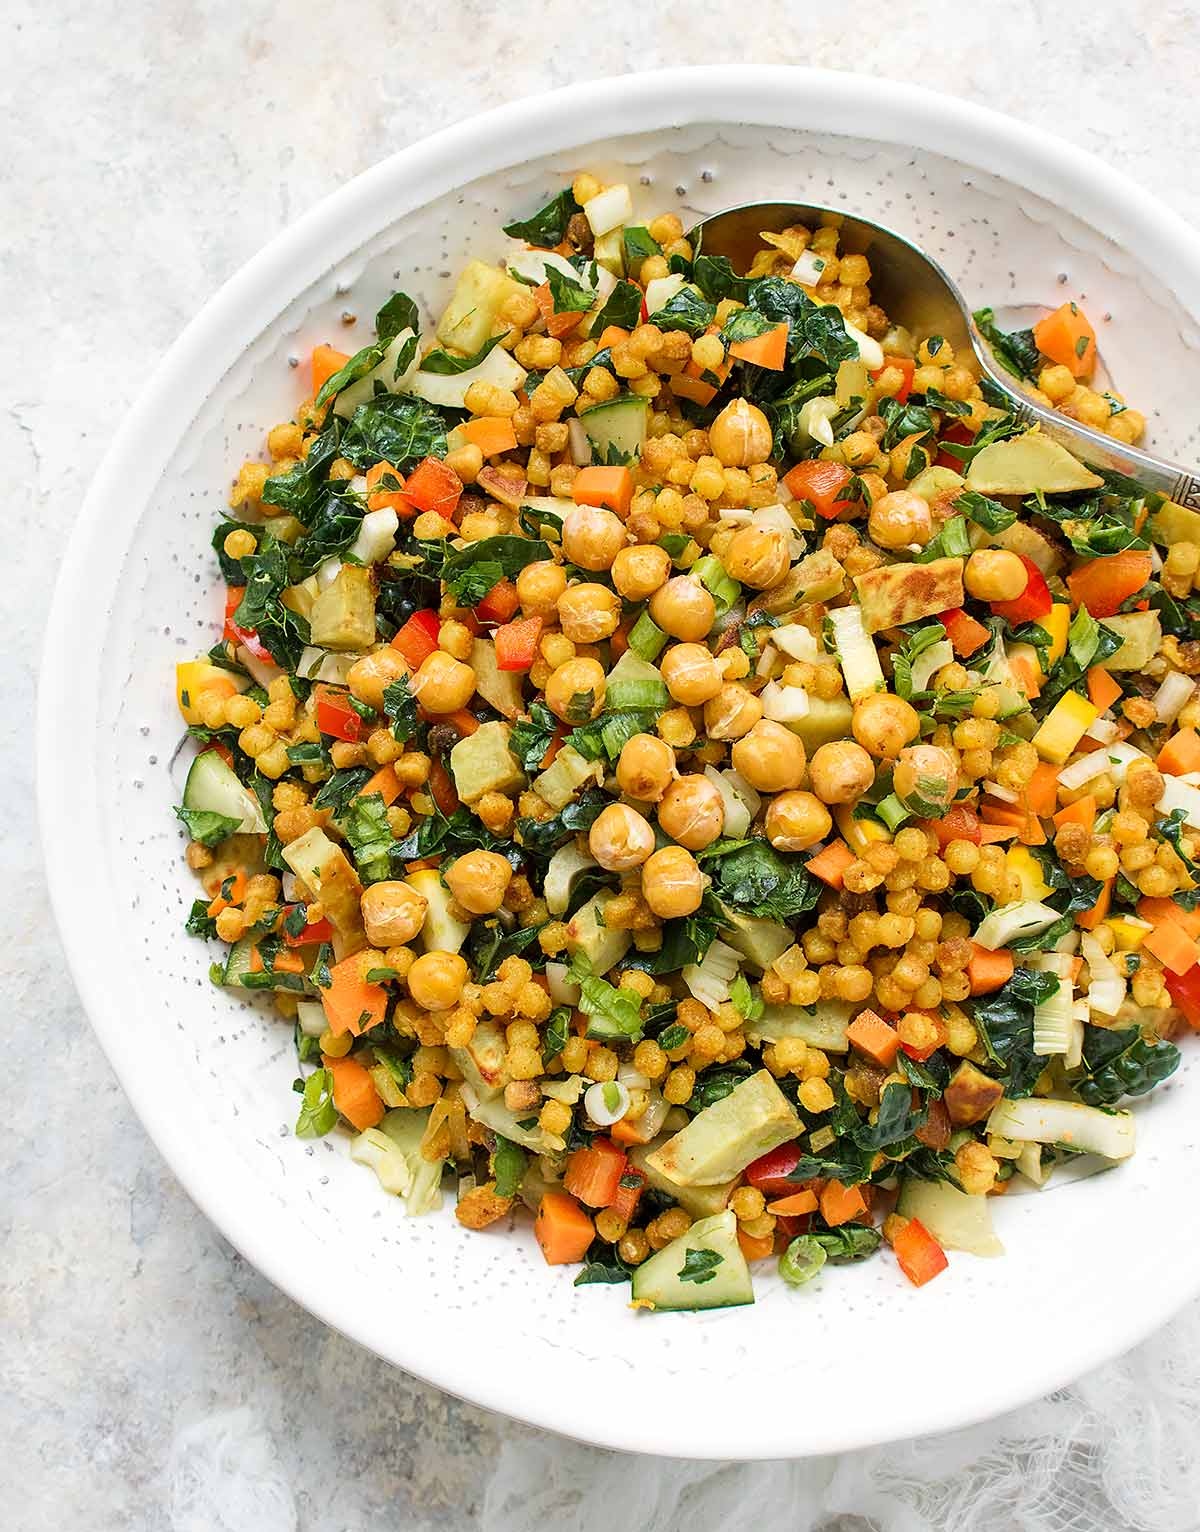 Fall Israeli Couscous Salad | Recipe at SoupAddict.com